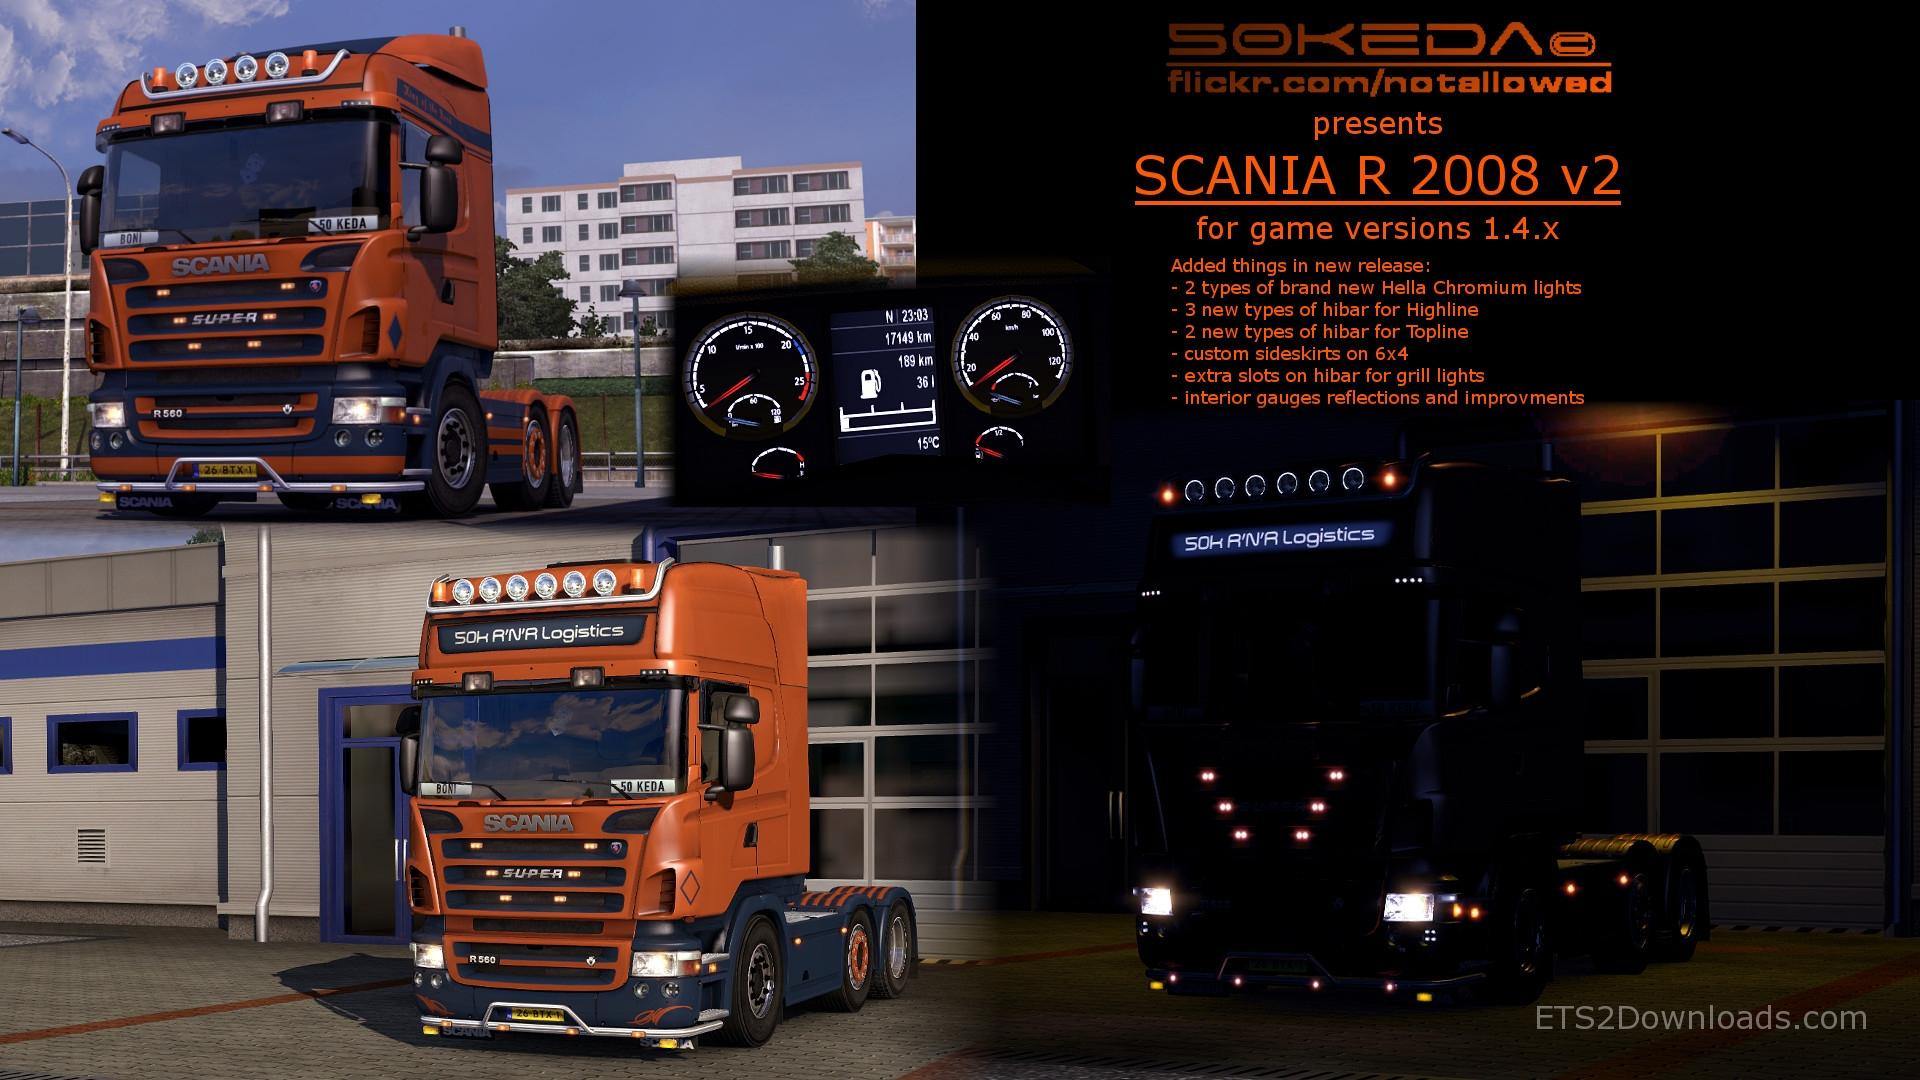 scania-r2008-50keda-1